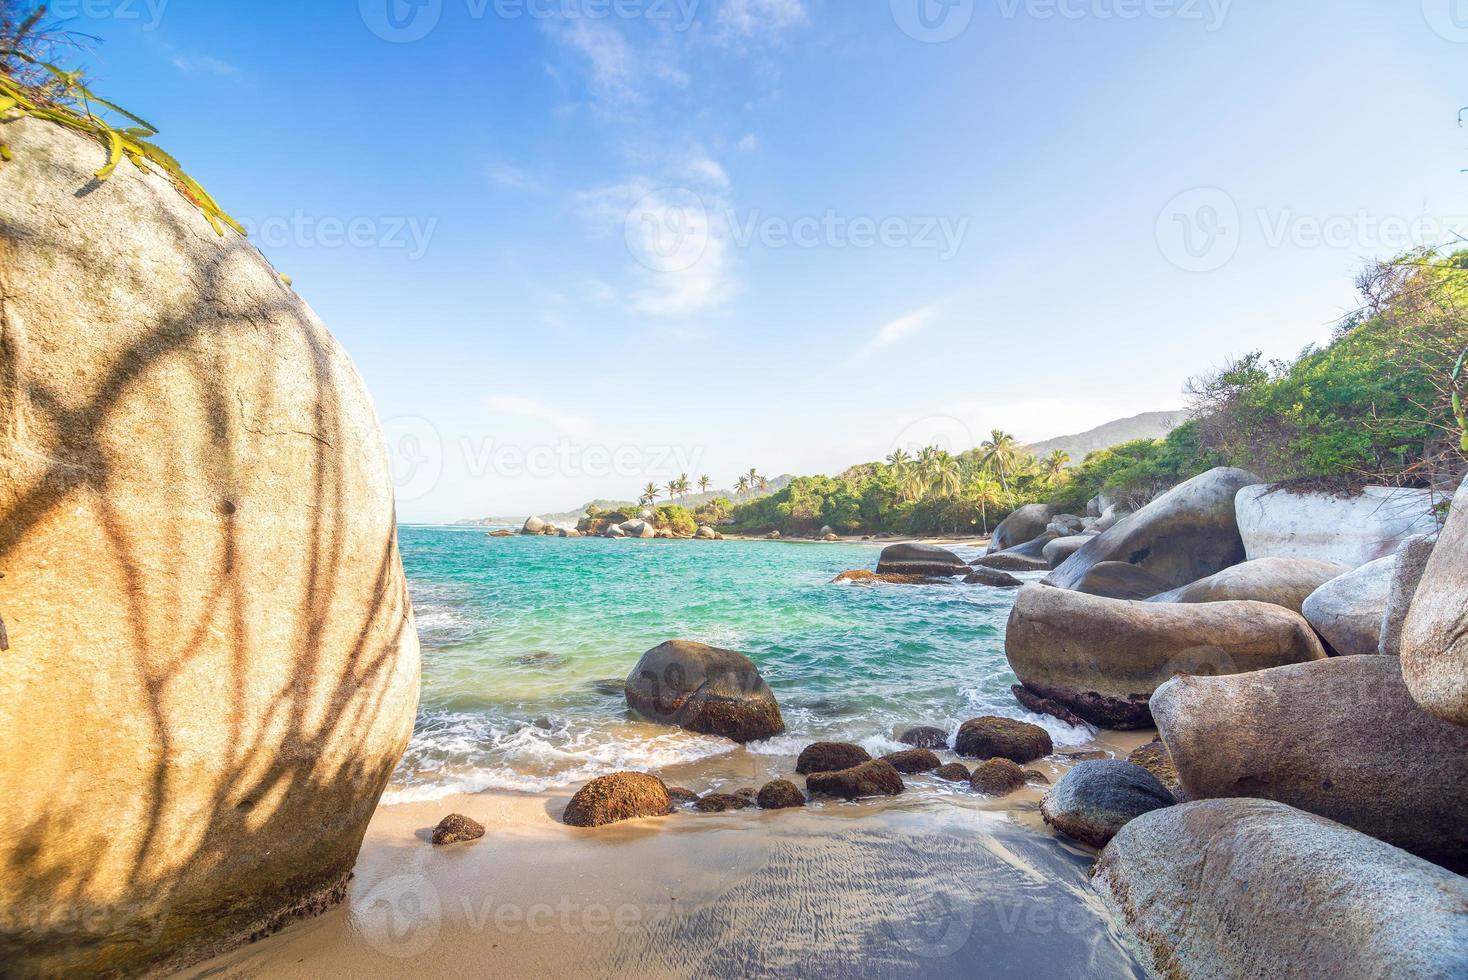 Rocks and Caribbean photo